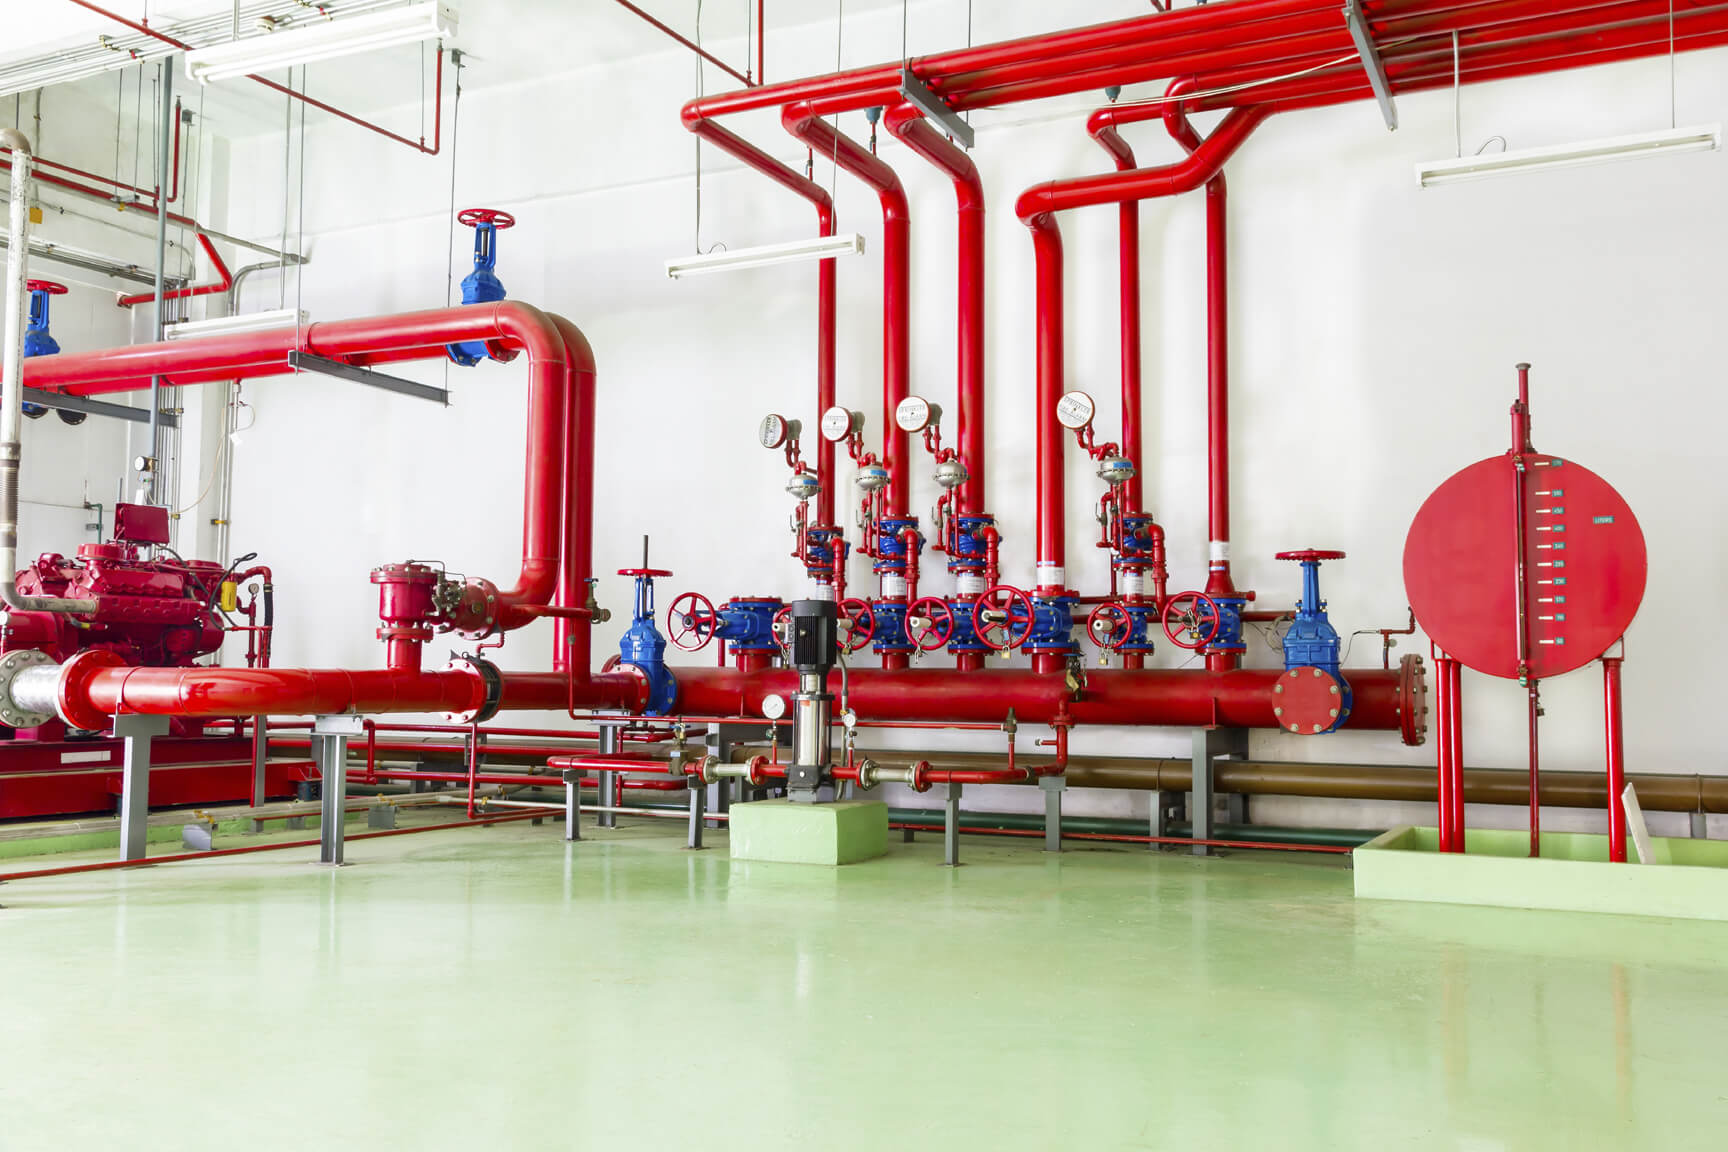 Dry pipe fire sprinkler systems company